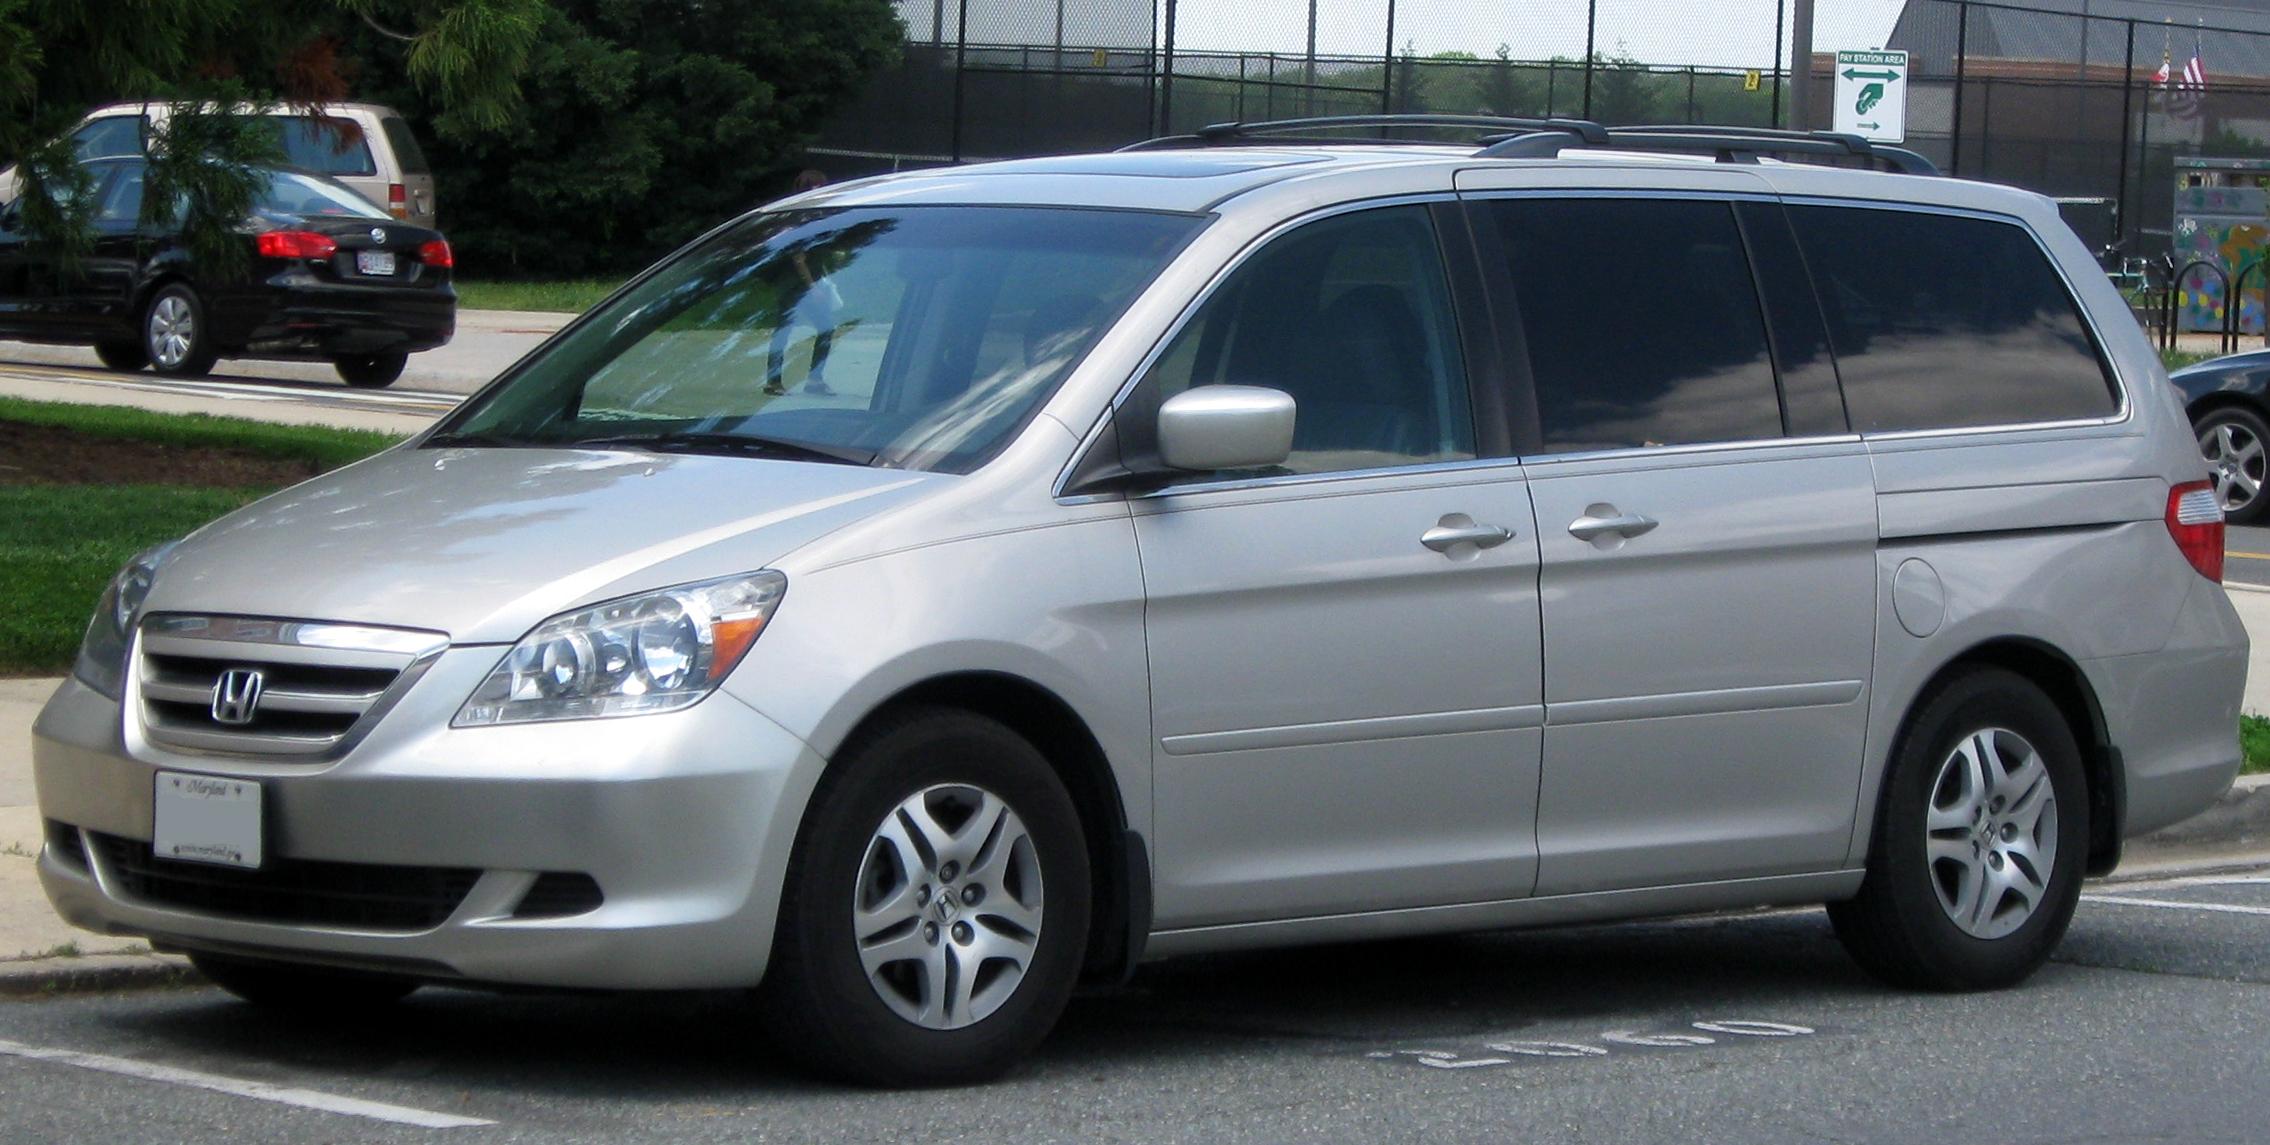 Honda Lagreat I 1998 - 2005 Minivan #4